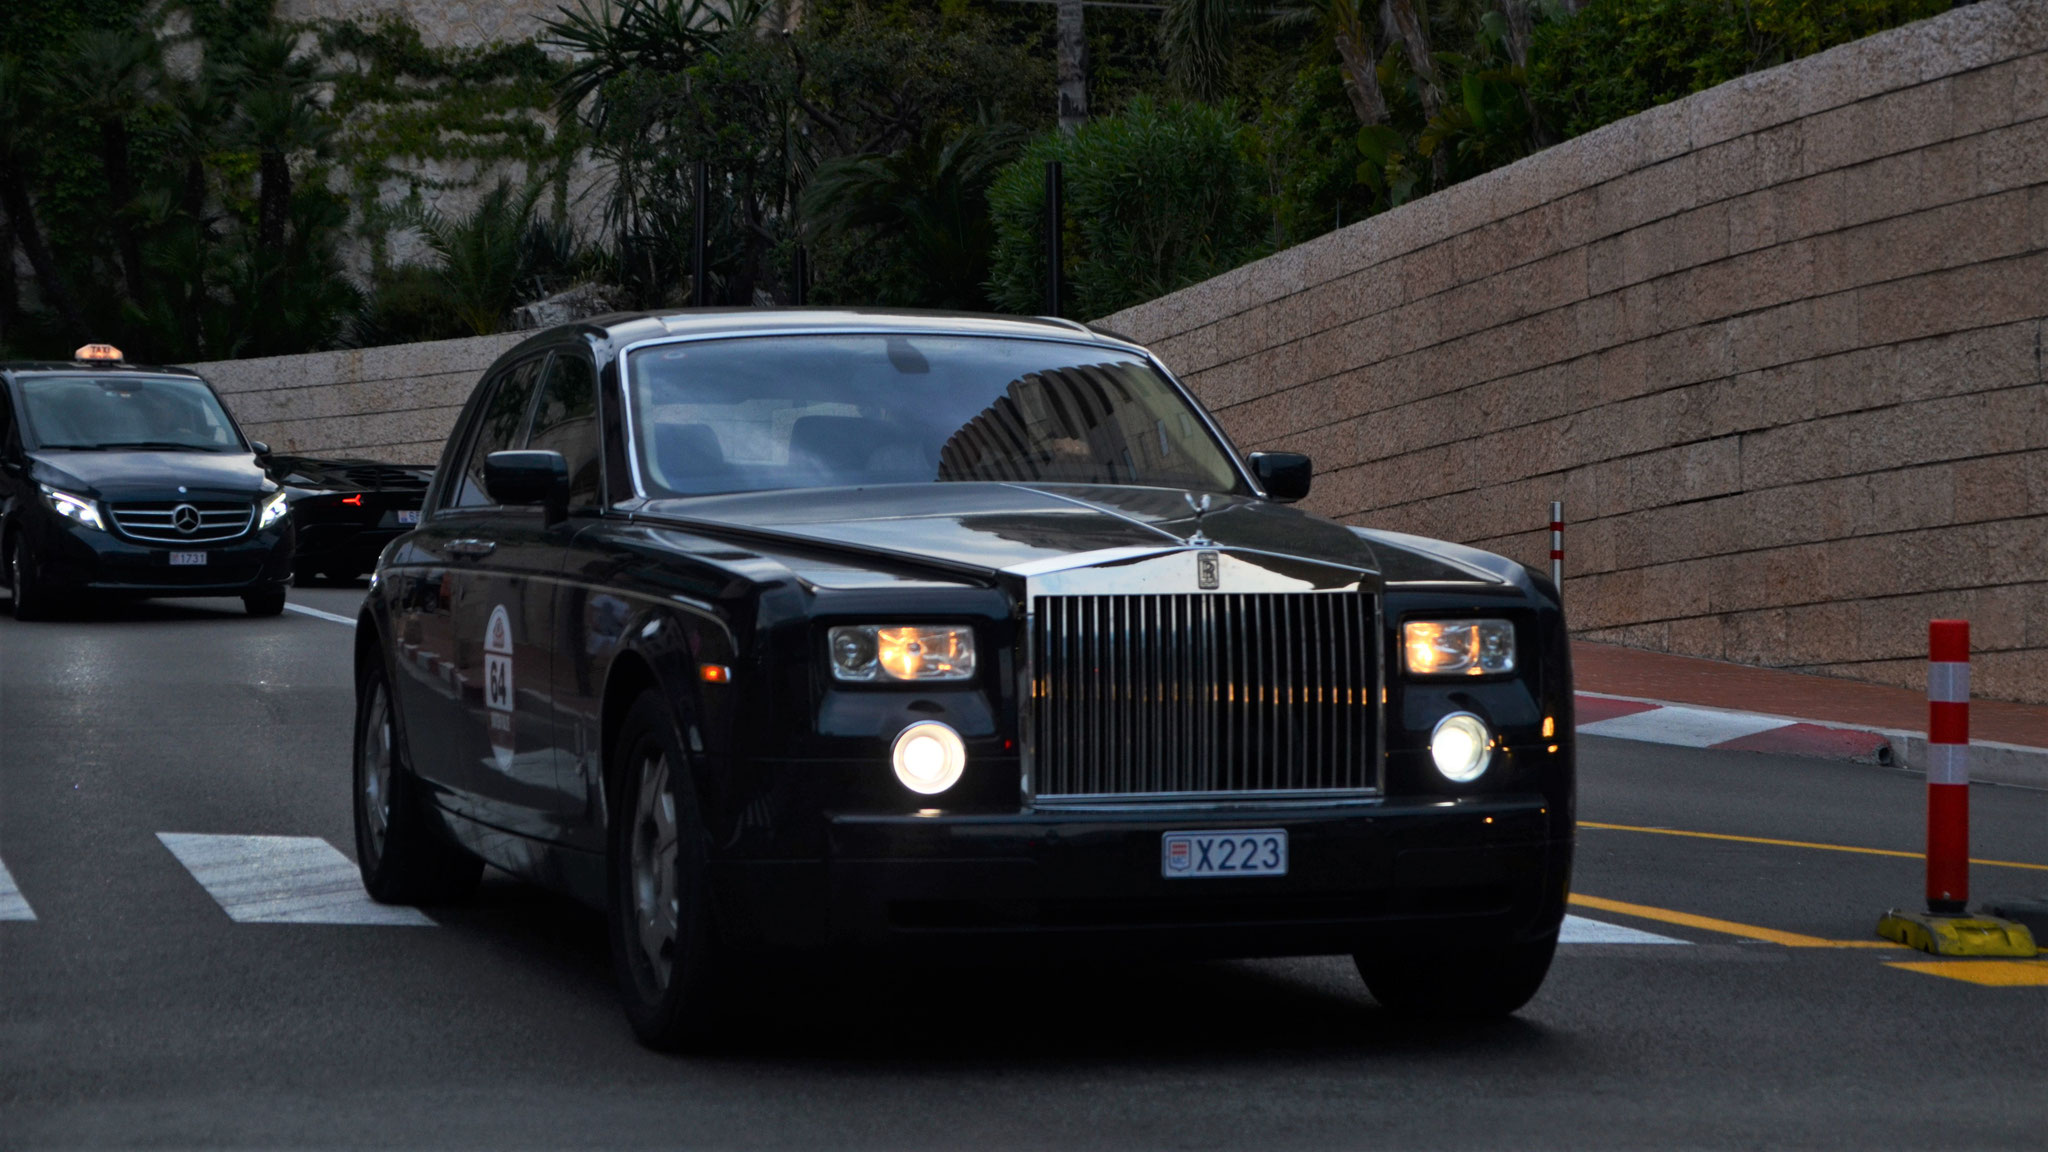 Rolls Royce Phantom - X223 (MC)